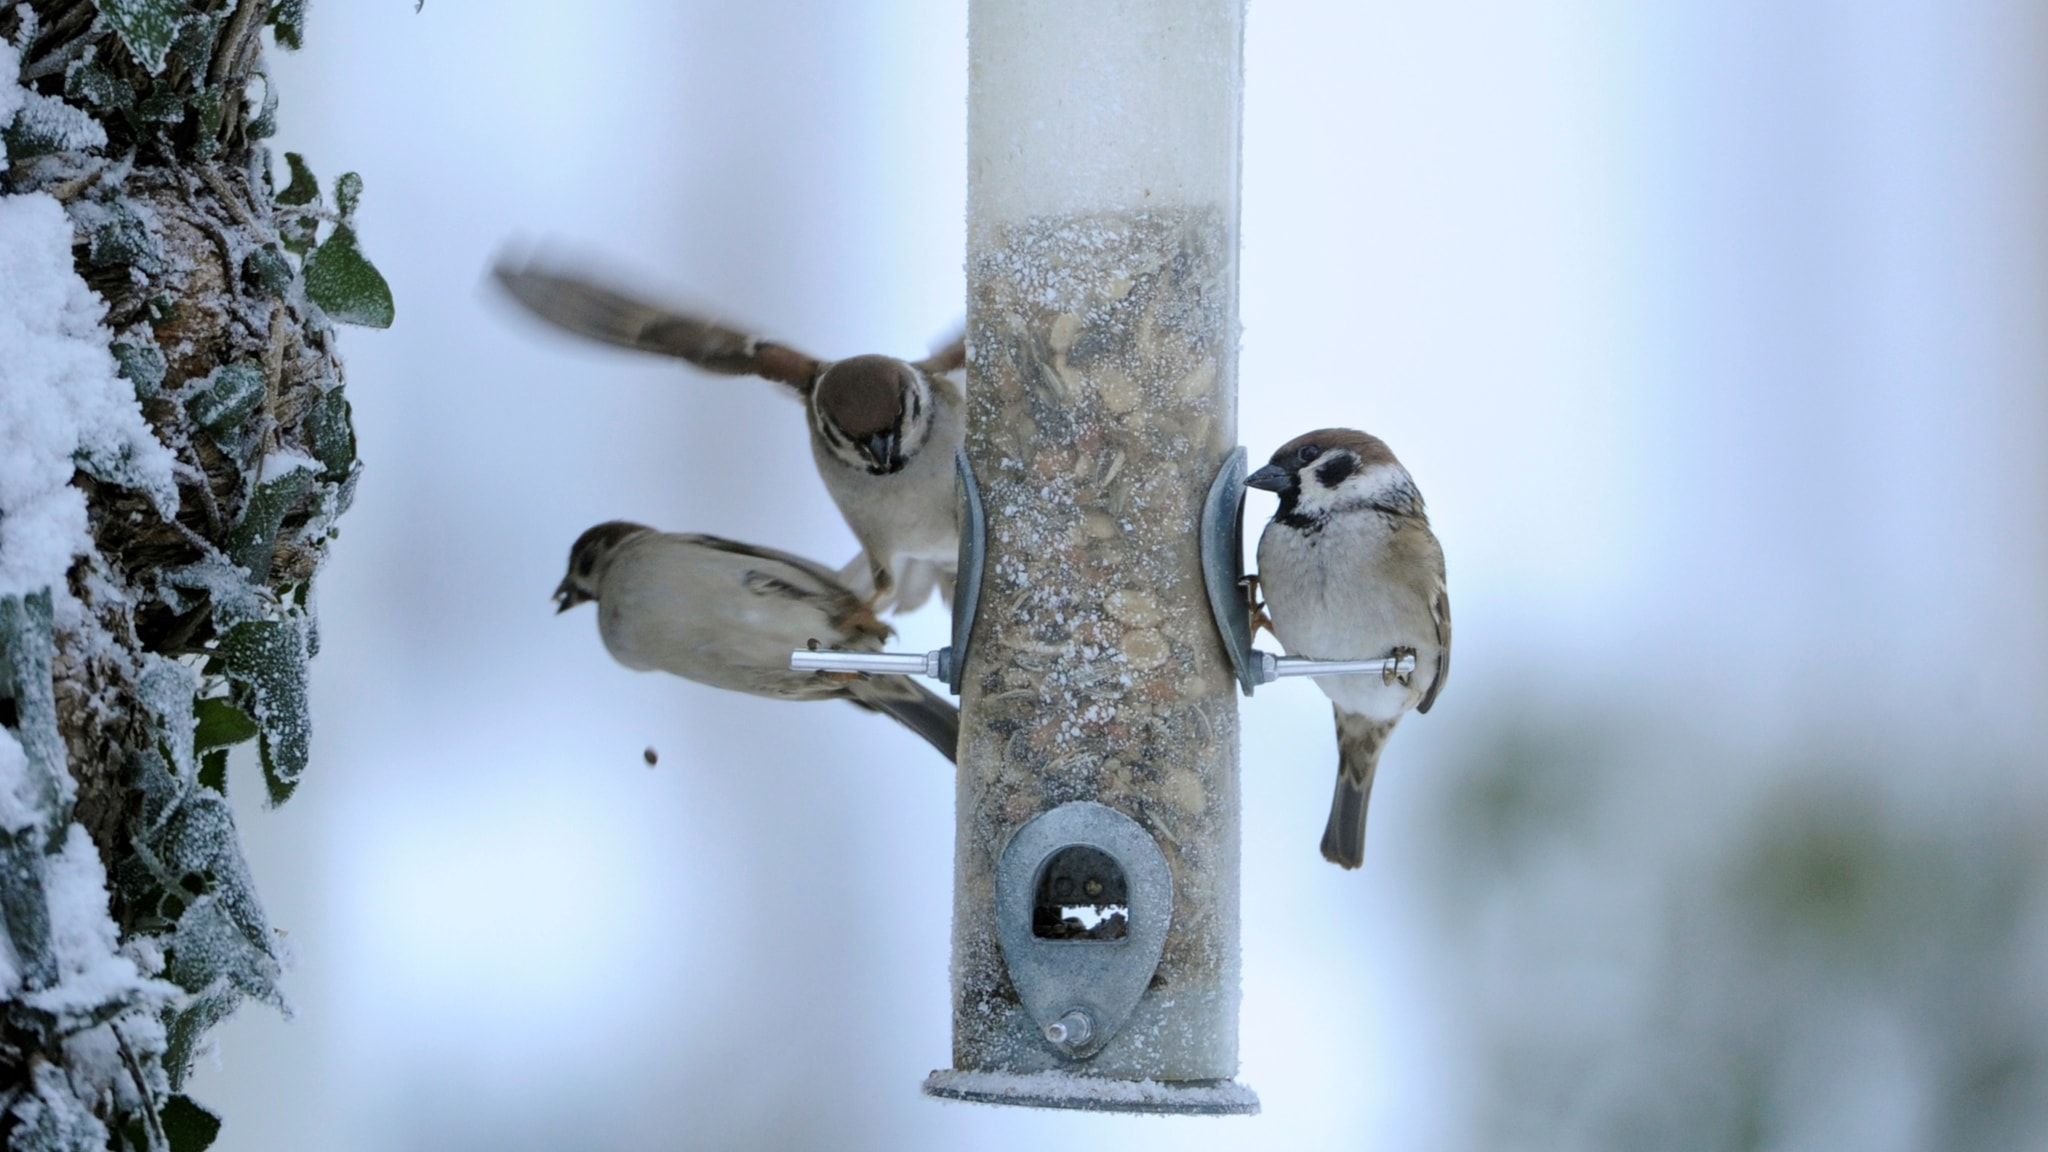 Lintuhavaintoja